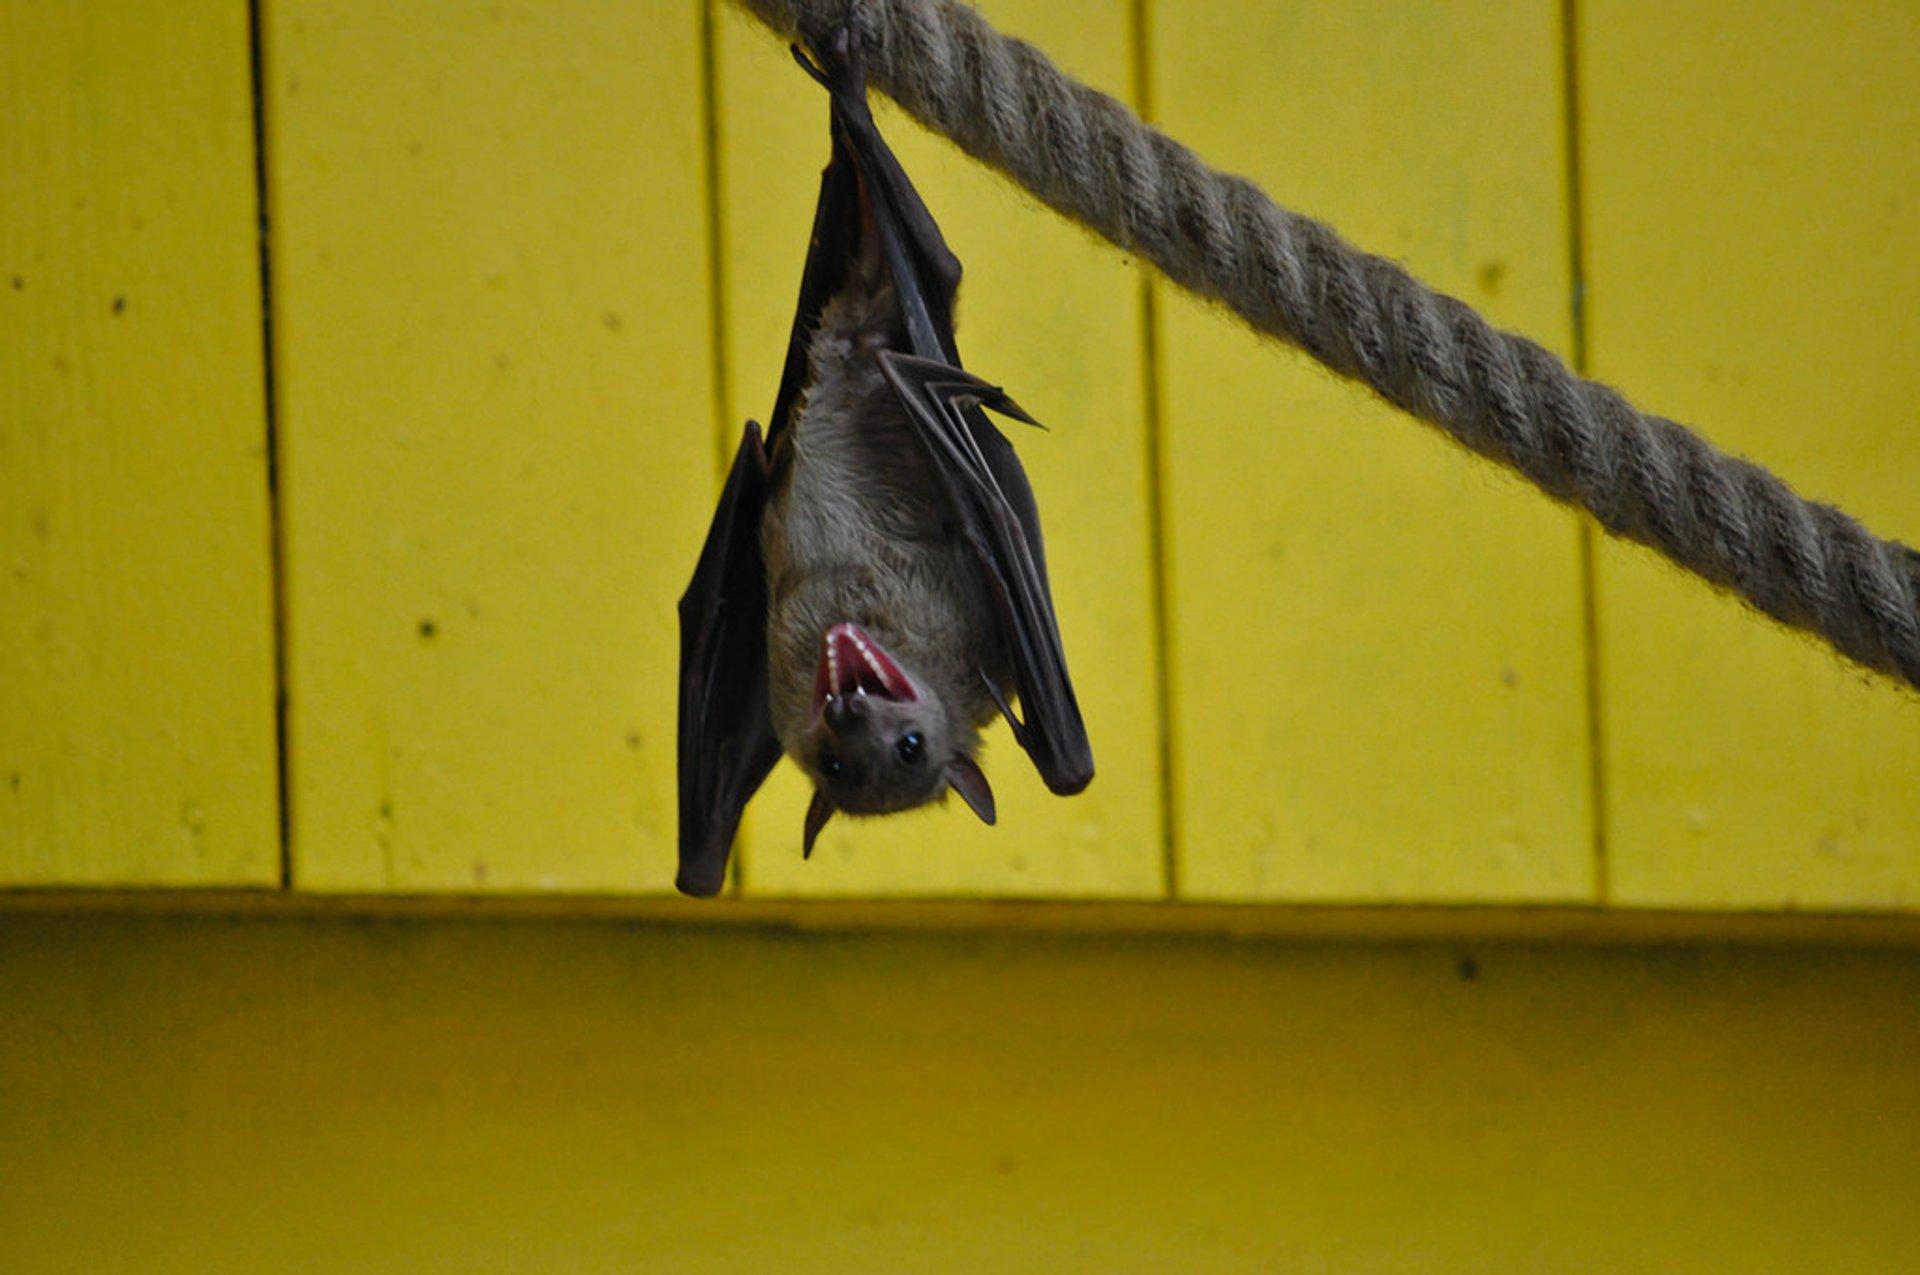 Bats Fluttering  in England 2019 - Best Time